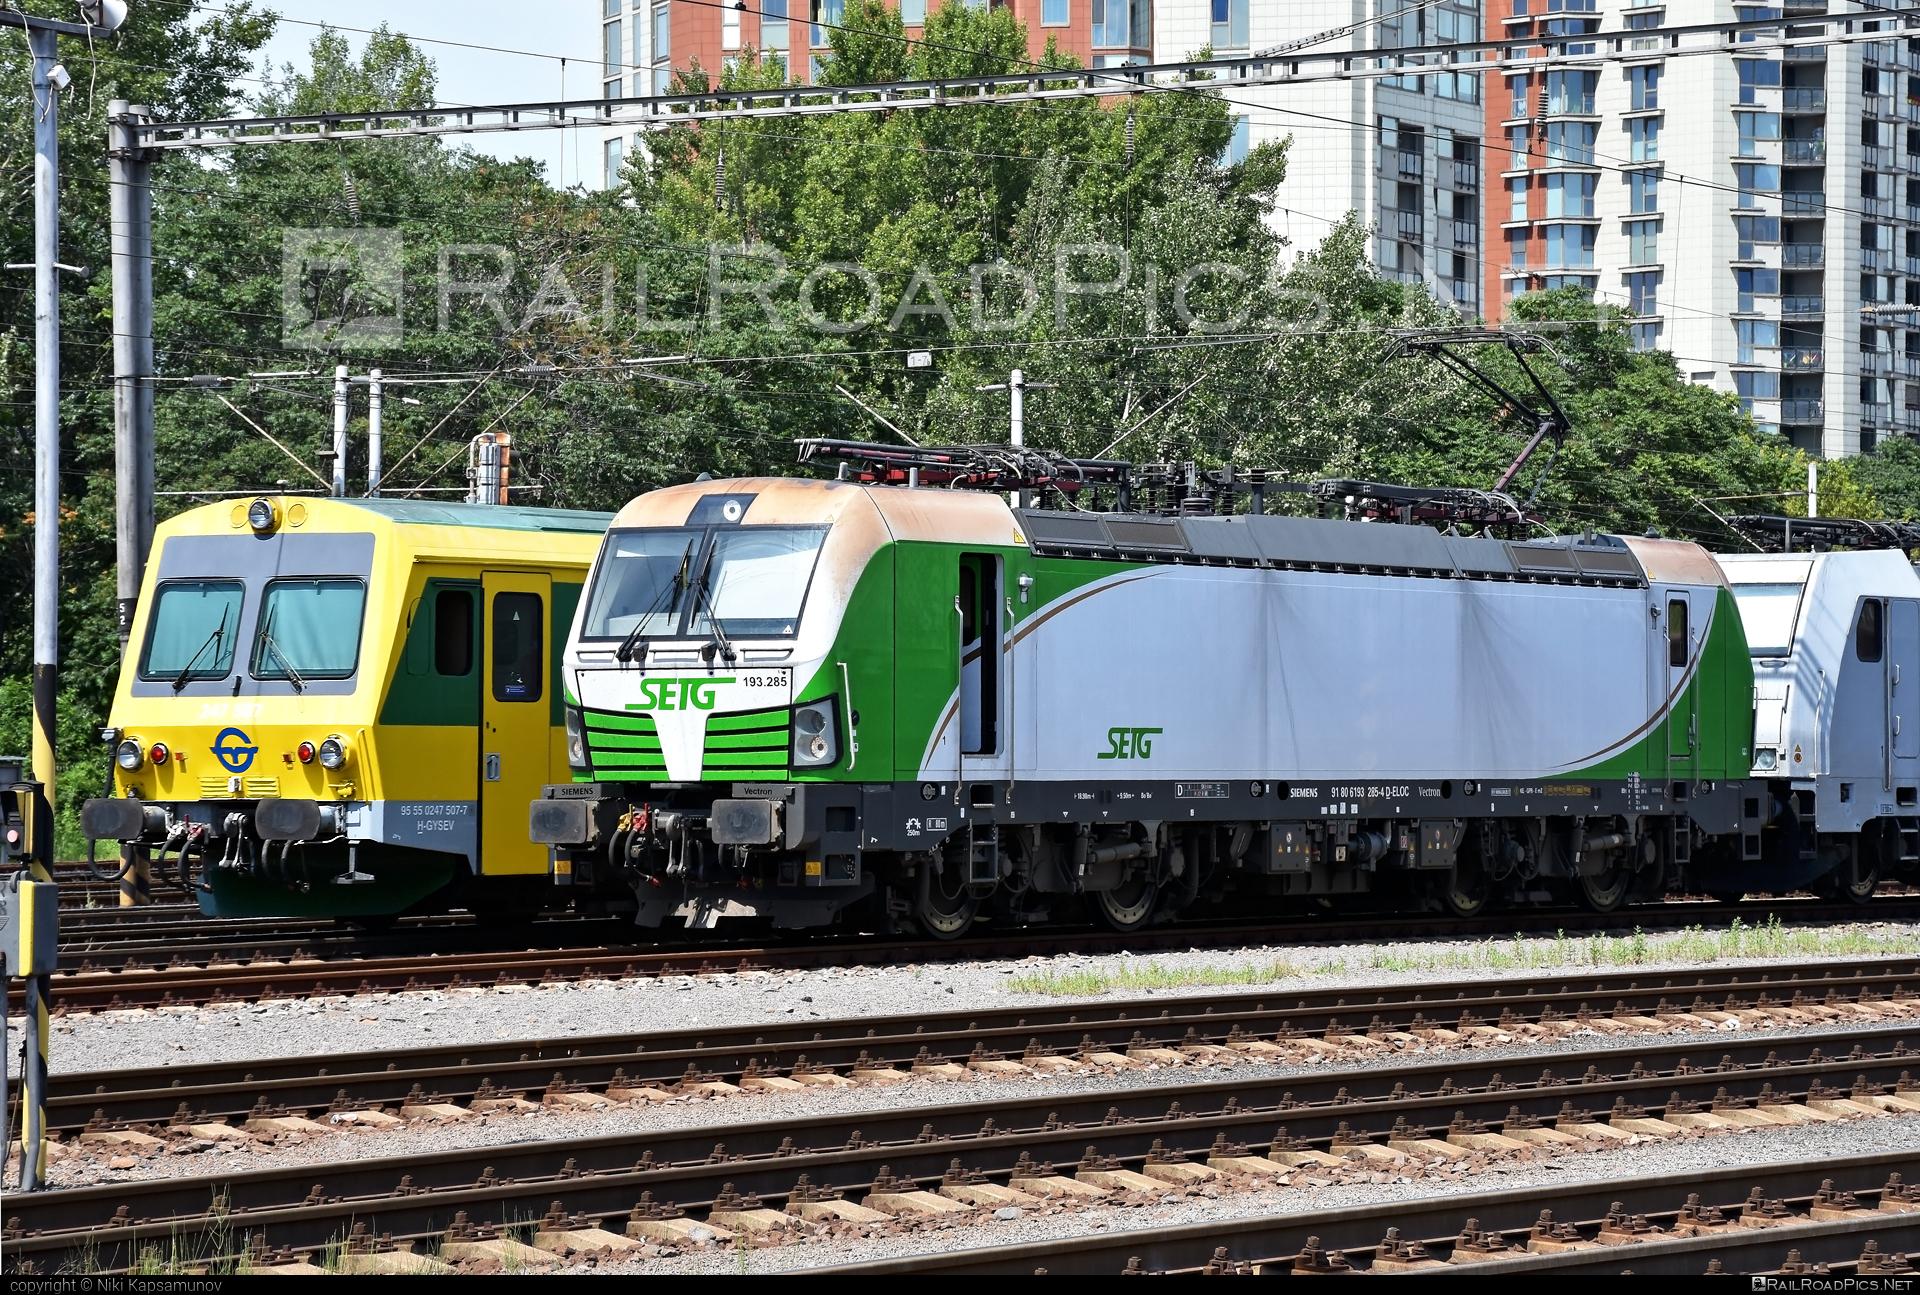 Siemens Vectron MS - 193 285 operated by Salzburger Eisenbahn Transportlogistik GmbH #SalzburgerEisenbahnTransportlogistik #SalzburgerEisenbahnTransportlogistikGmbH #ell #ellgermany #eloc #europeanlocomotiveleasing #setg #siemens #siemensvectron #siemensvectronms #vectron #vectronms